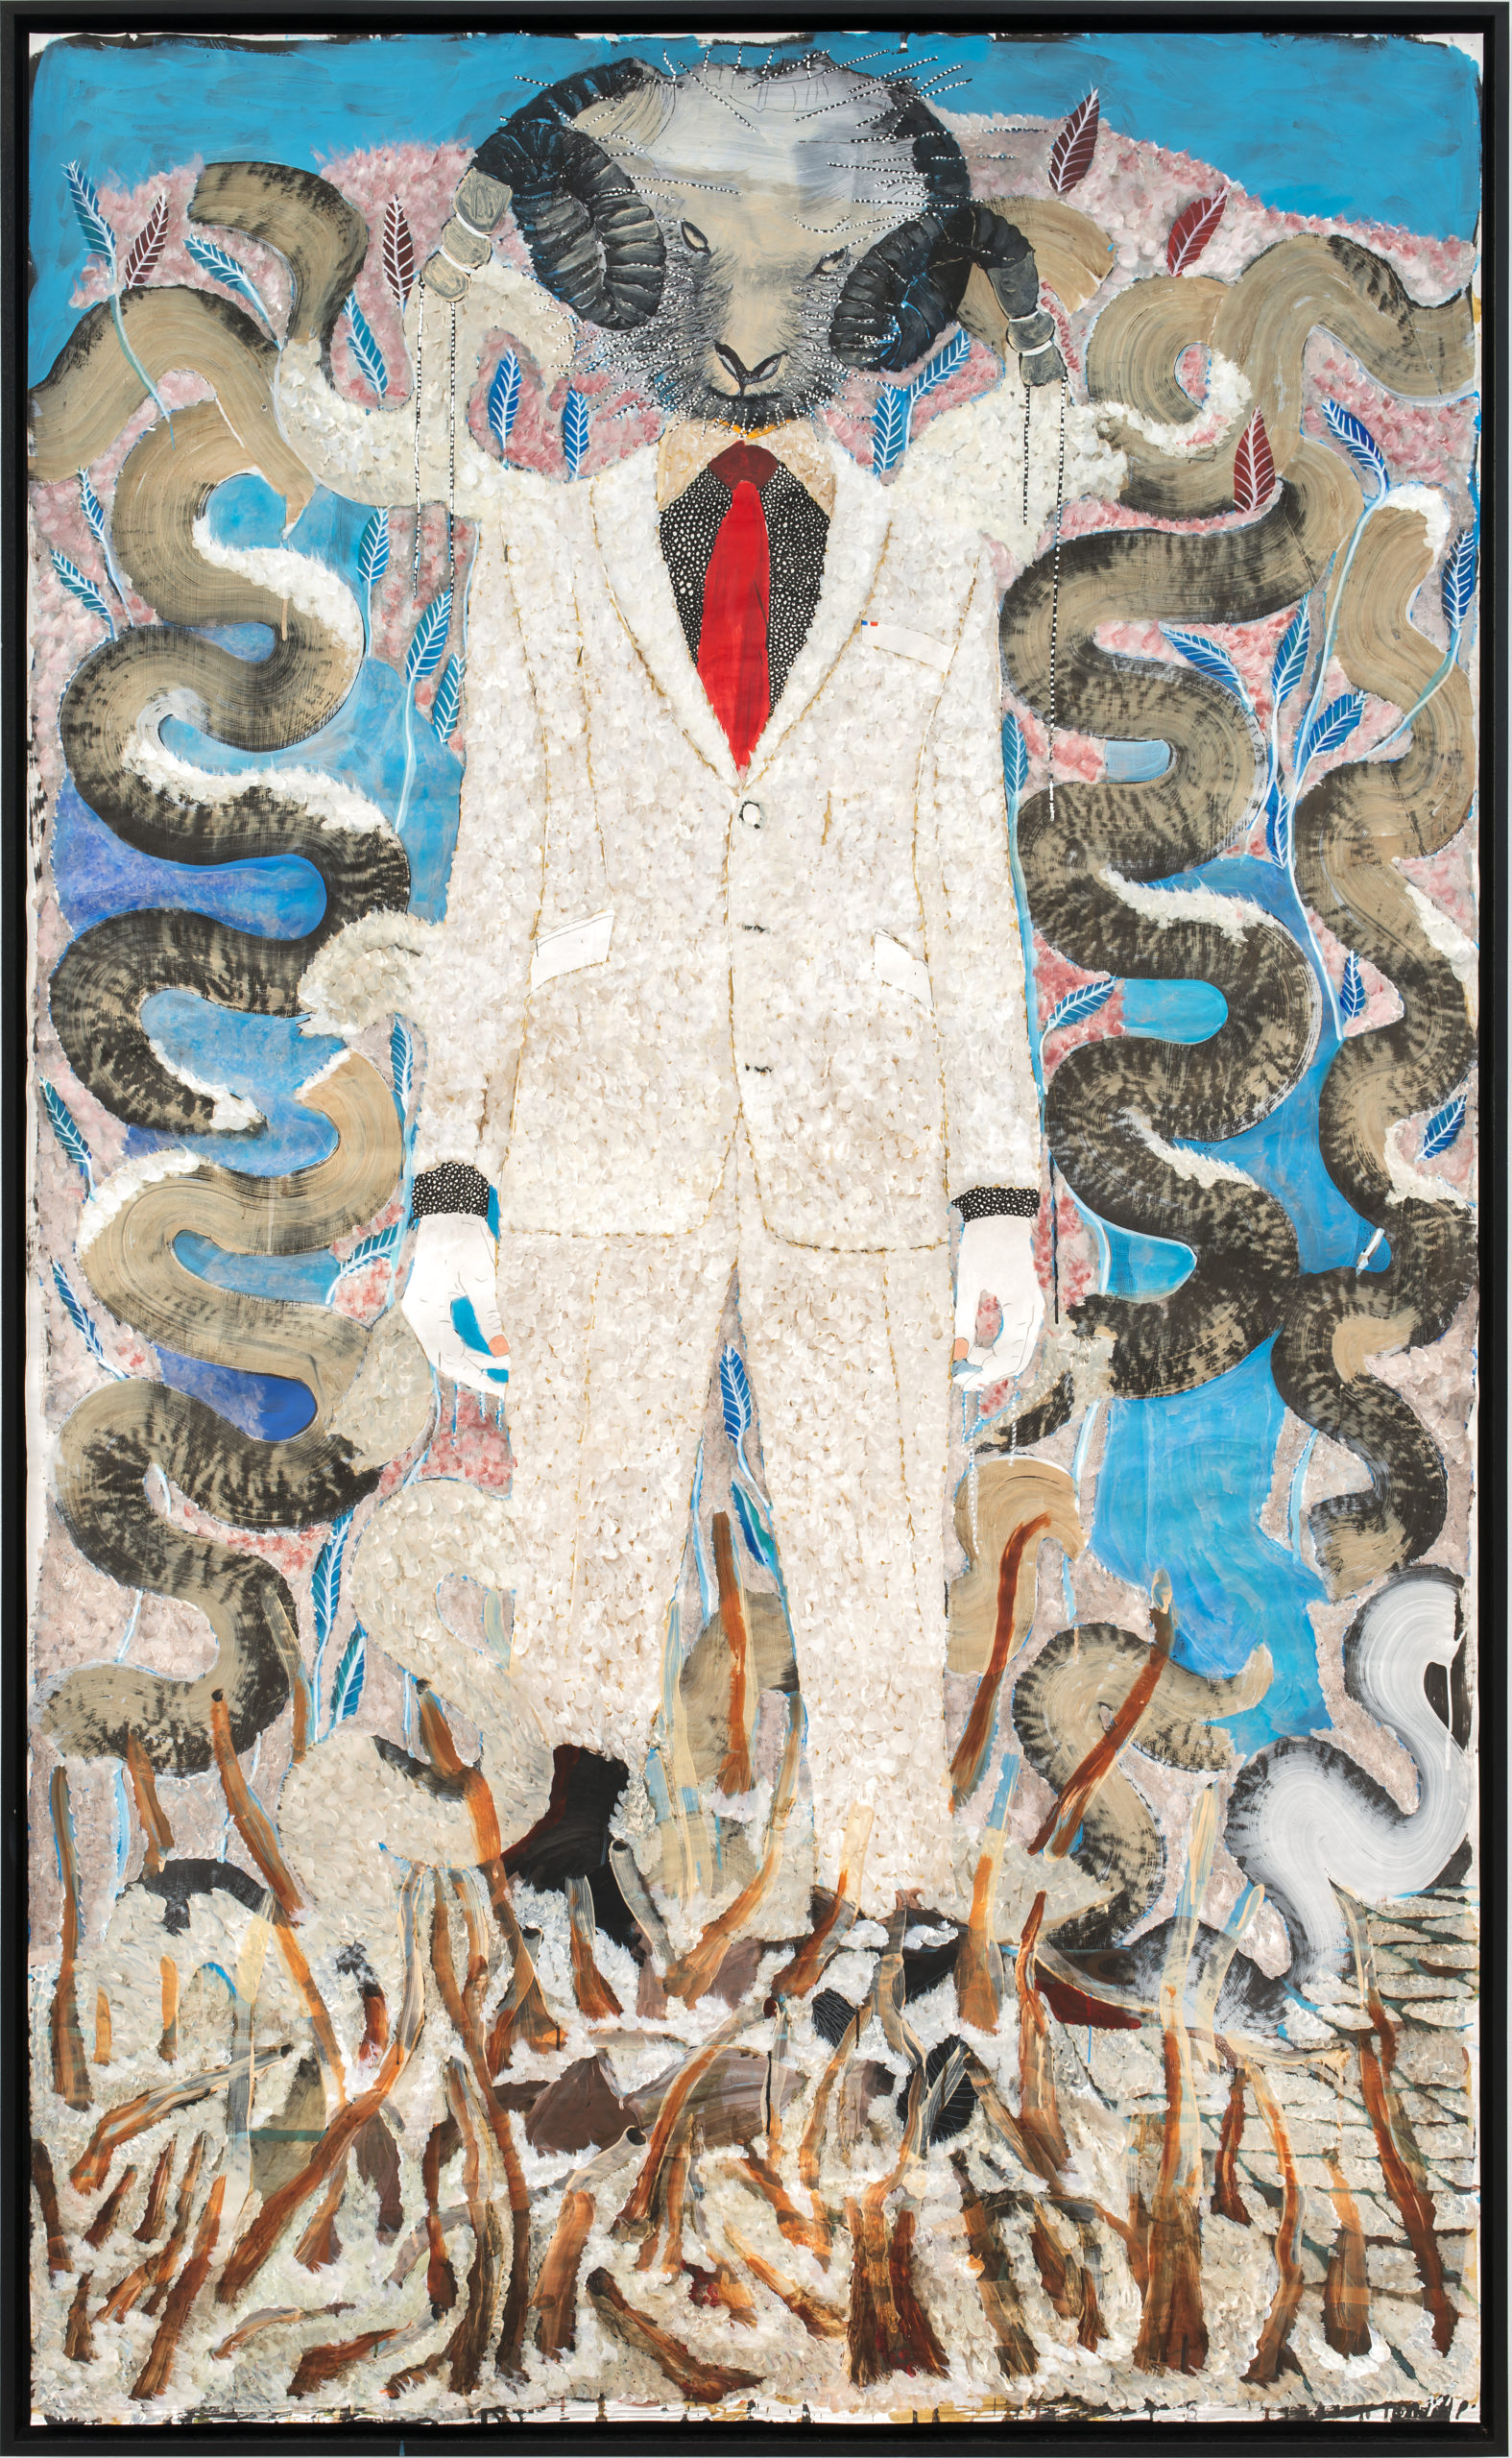 OMAR BA Man and Superman I, 2021   Acrylique, crayon, huile, encre de chine et stylo sur carton / Acrylic, pencil, oil, Indian ink and Bic pen on cardboard 250 x 150 cm – 98 3/7 x 59 1/16 in.